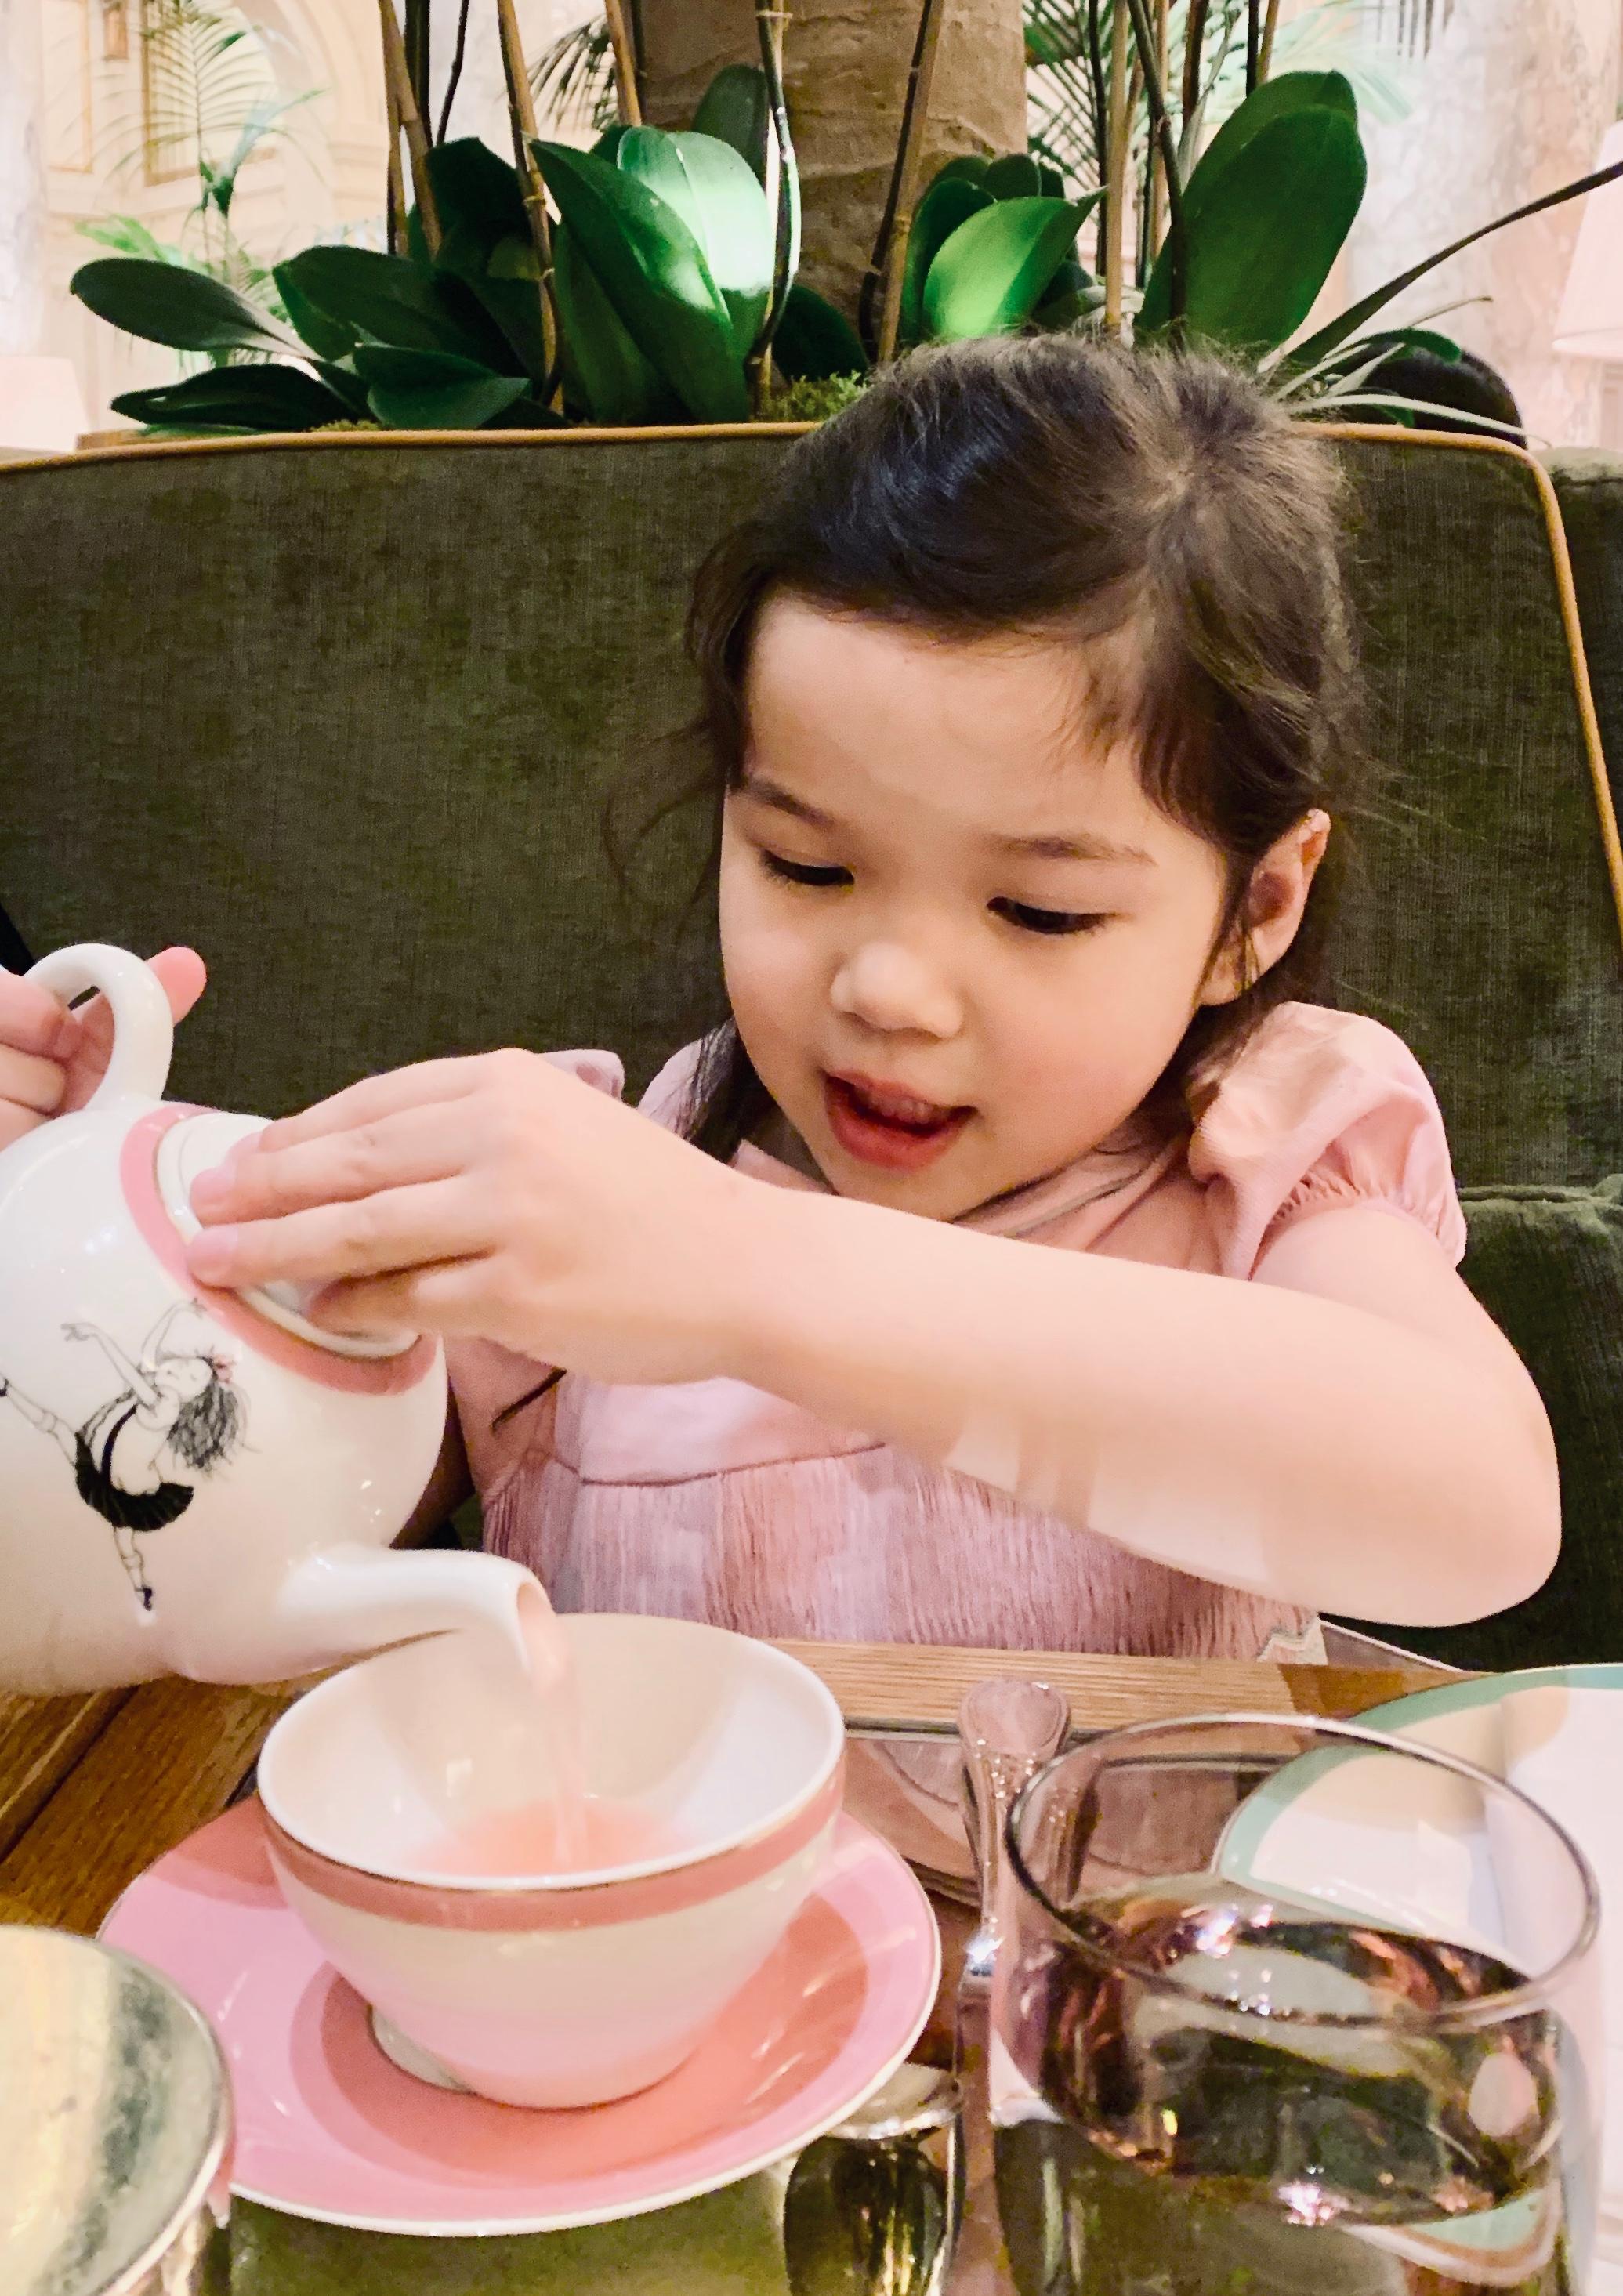 Tea at the Plaza Hotel New York - Kate is wearing her favorite handmade pink velvet dress